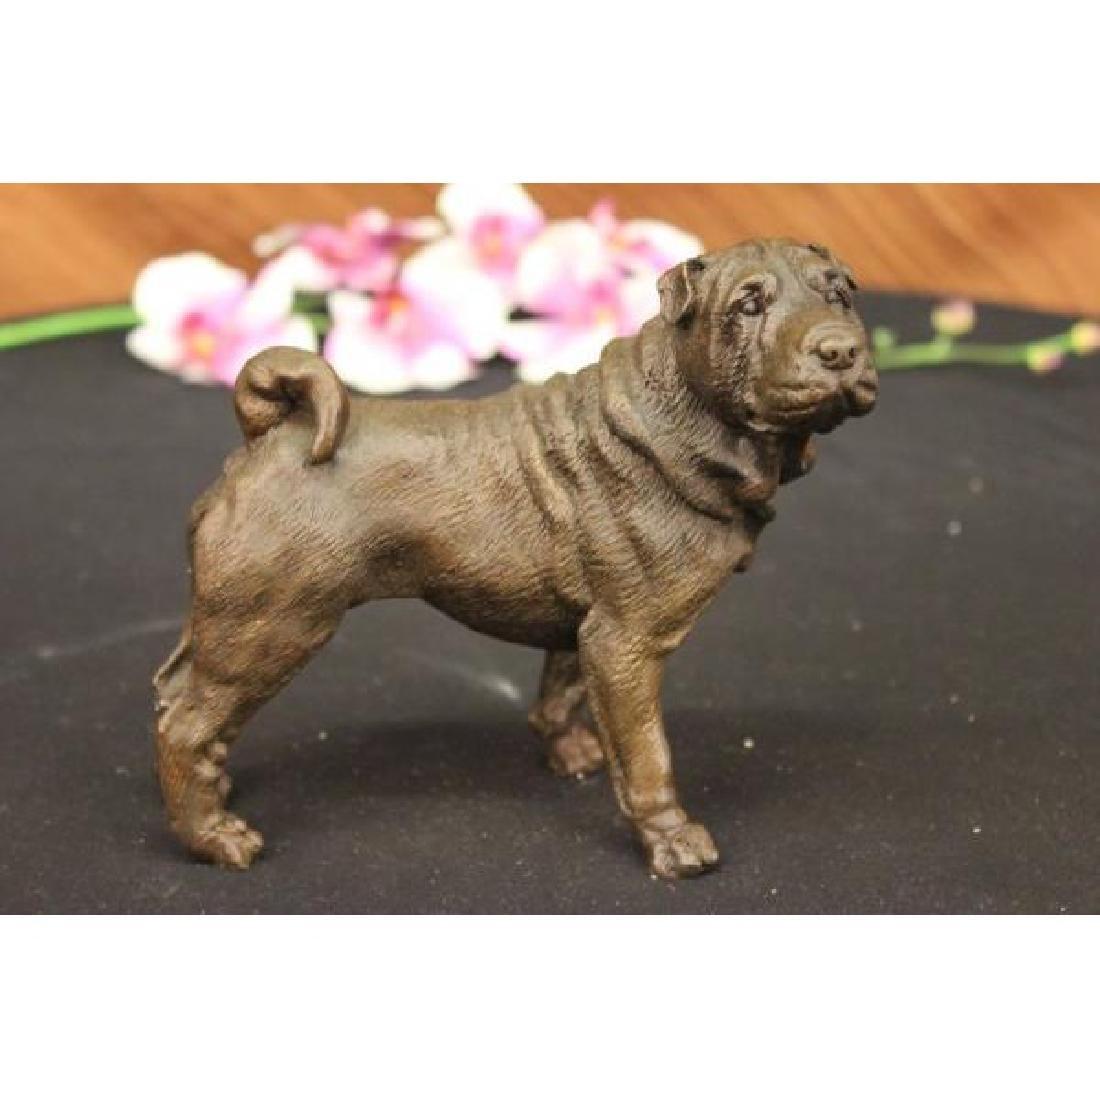 Milo English Bull Dog Bronze Sculpture Animal Pet